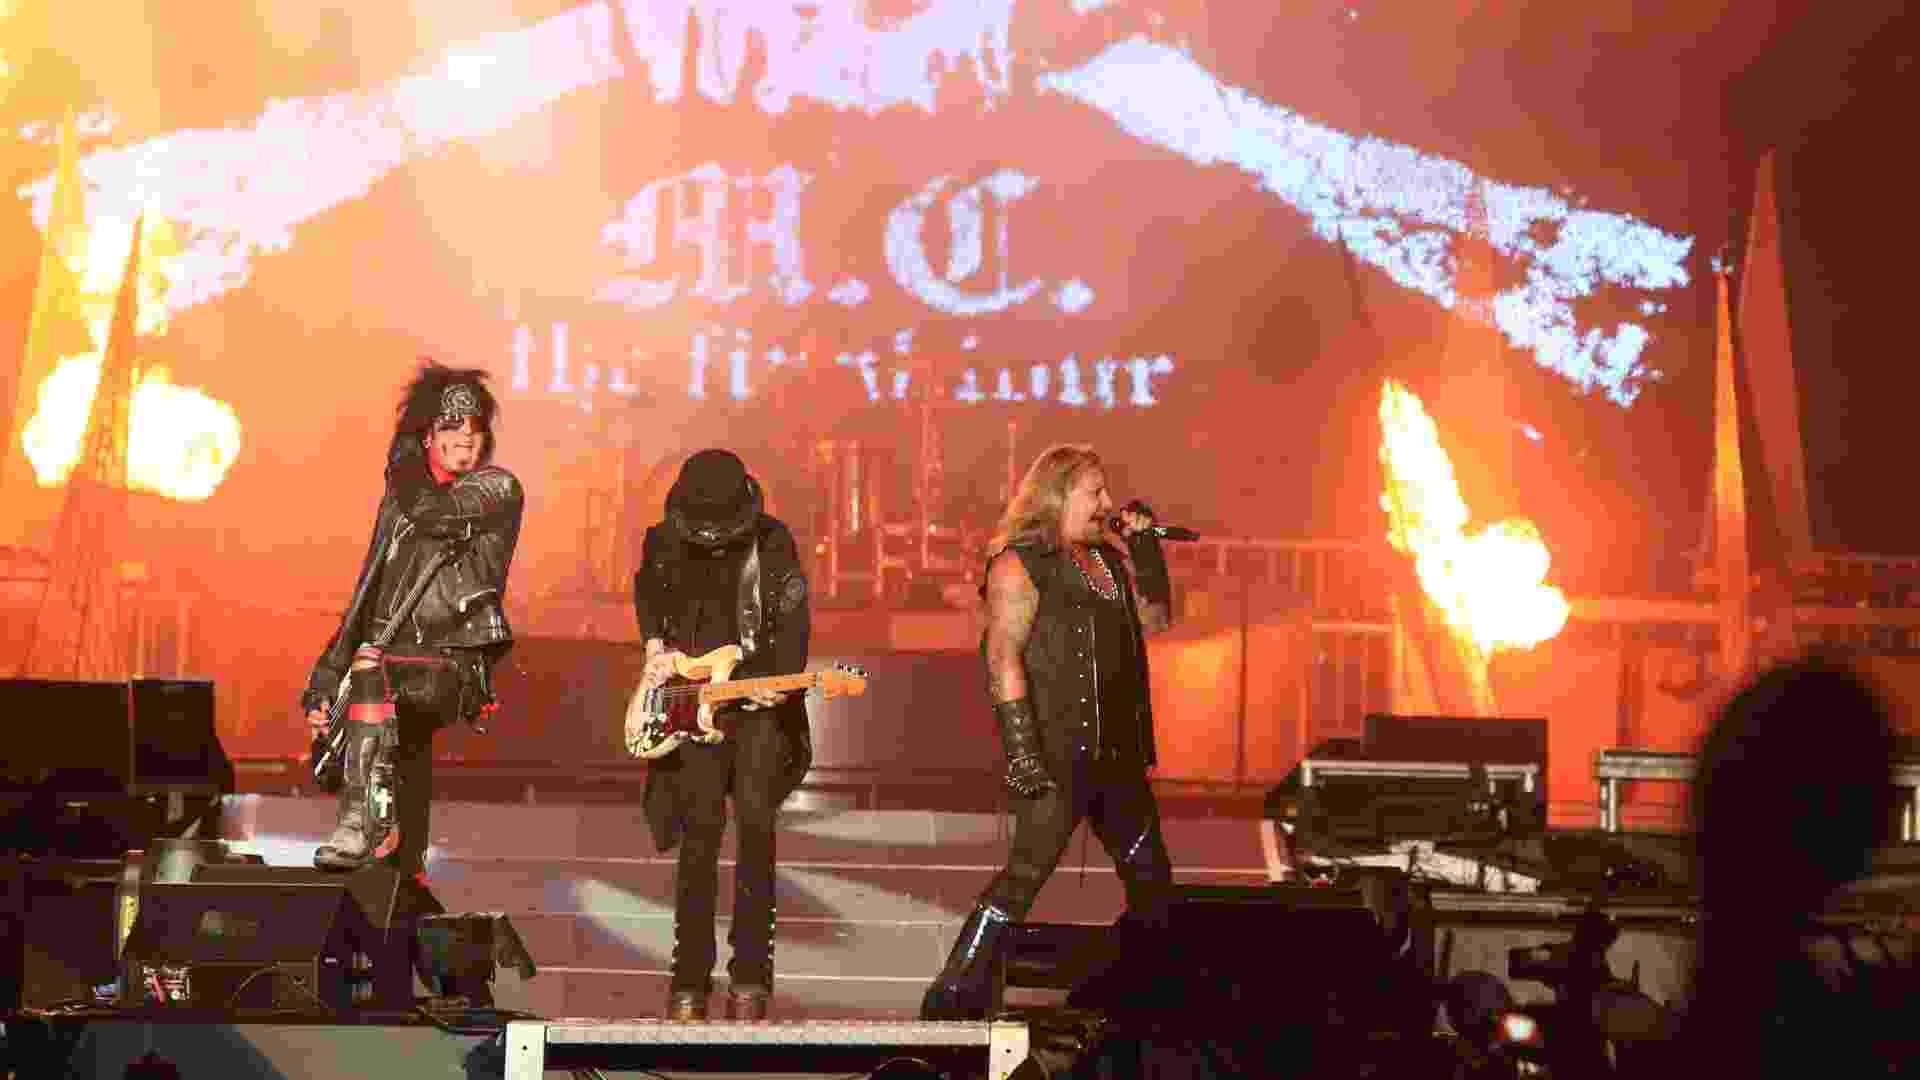 19.set.2015 - Mötley Crüe se apresenta no Palco Mundo no segundo dia do Rock in Rio 2015. Este é o último ano de apresentações do grupo, que irá se aposentar - Marco Antonio Teixeira/UOL